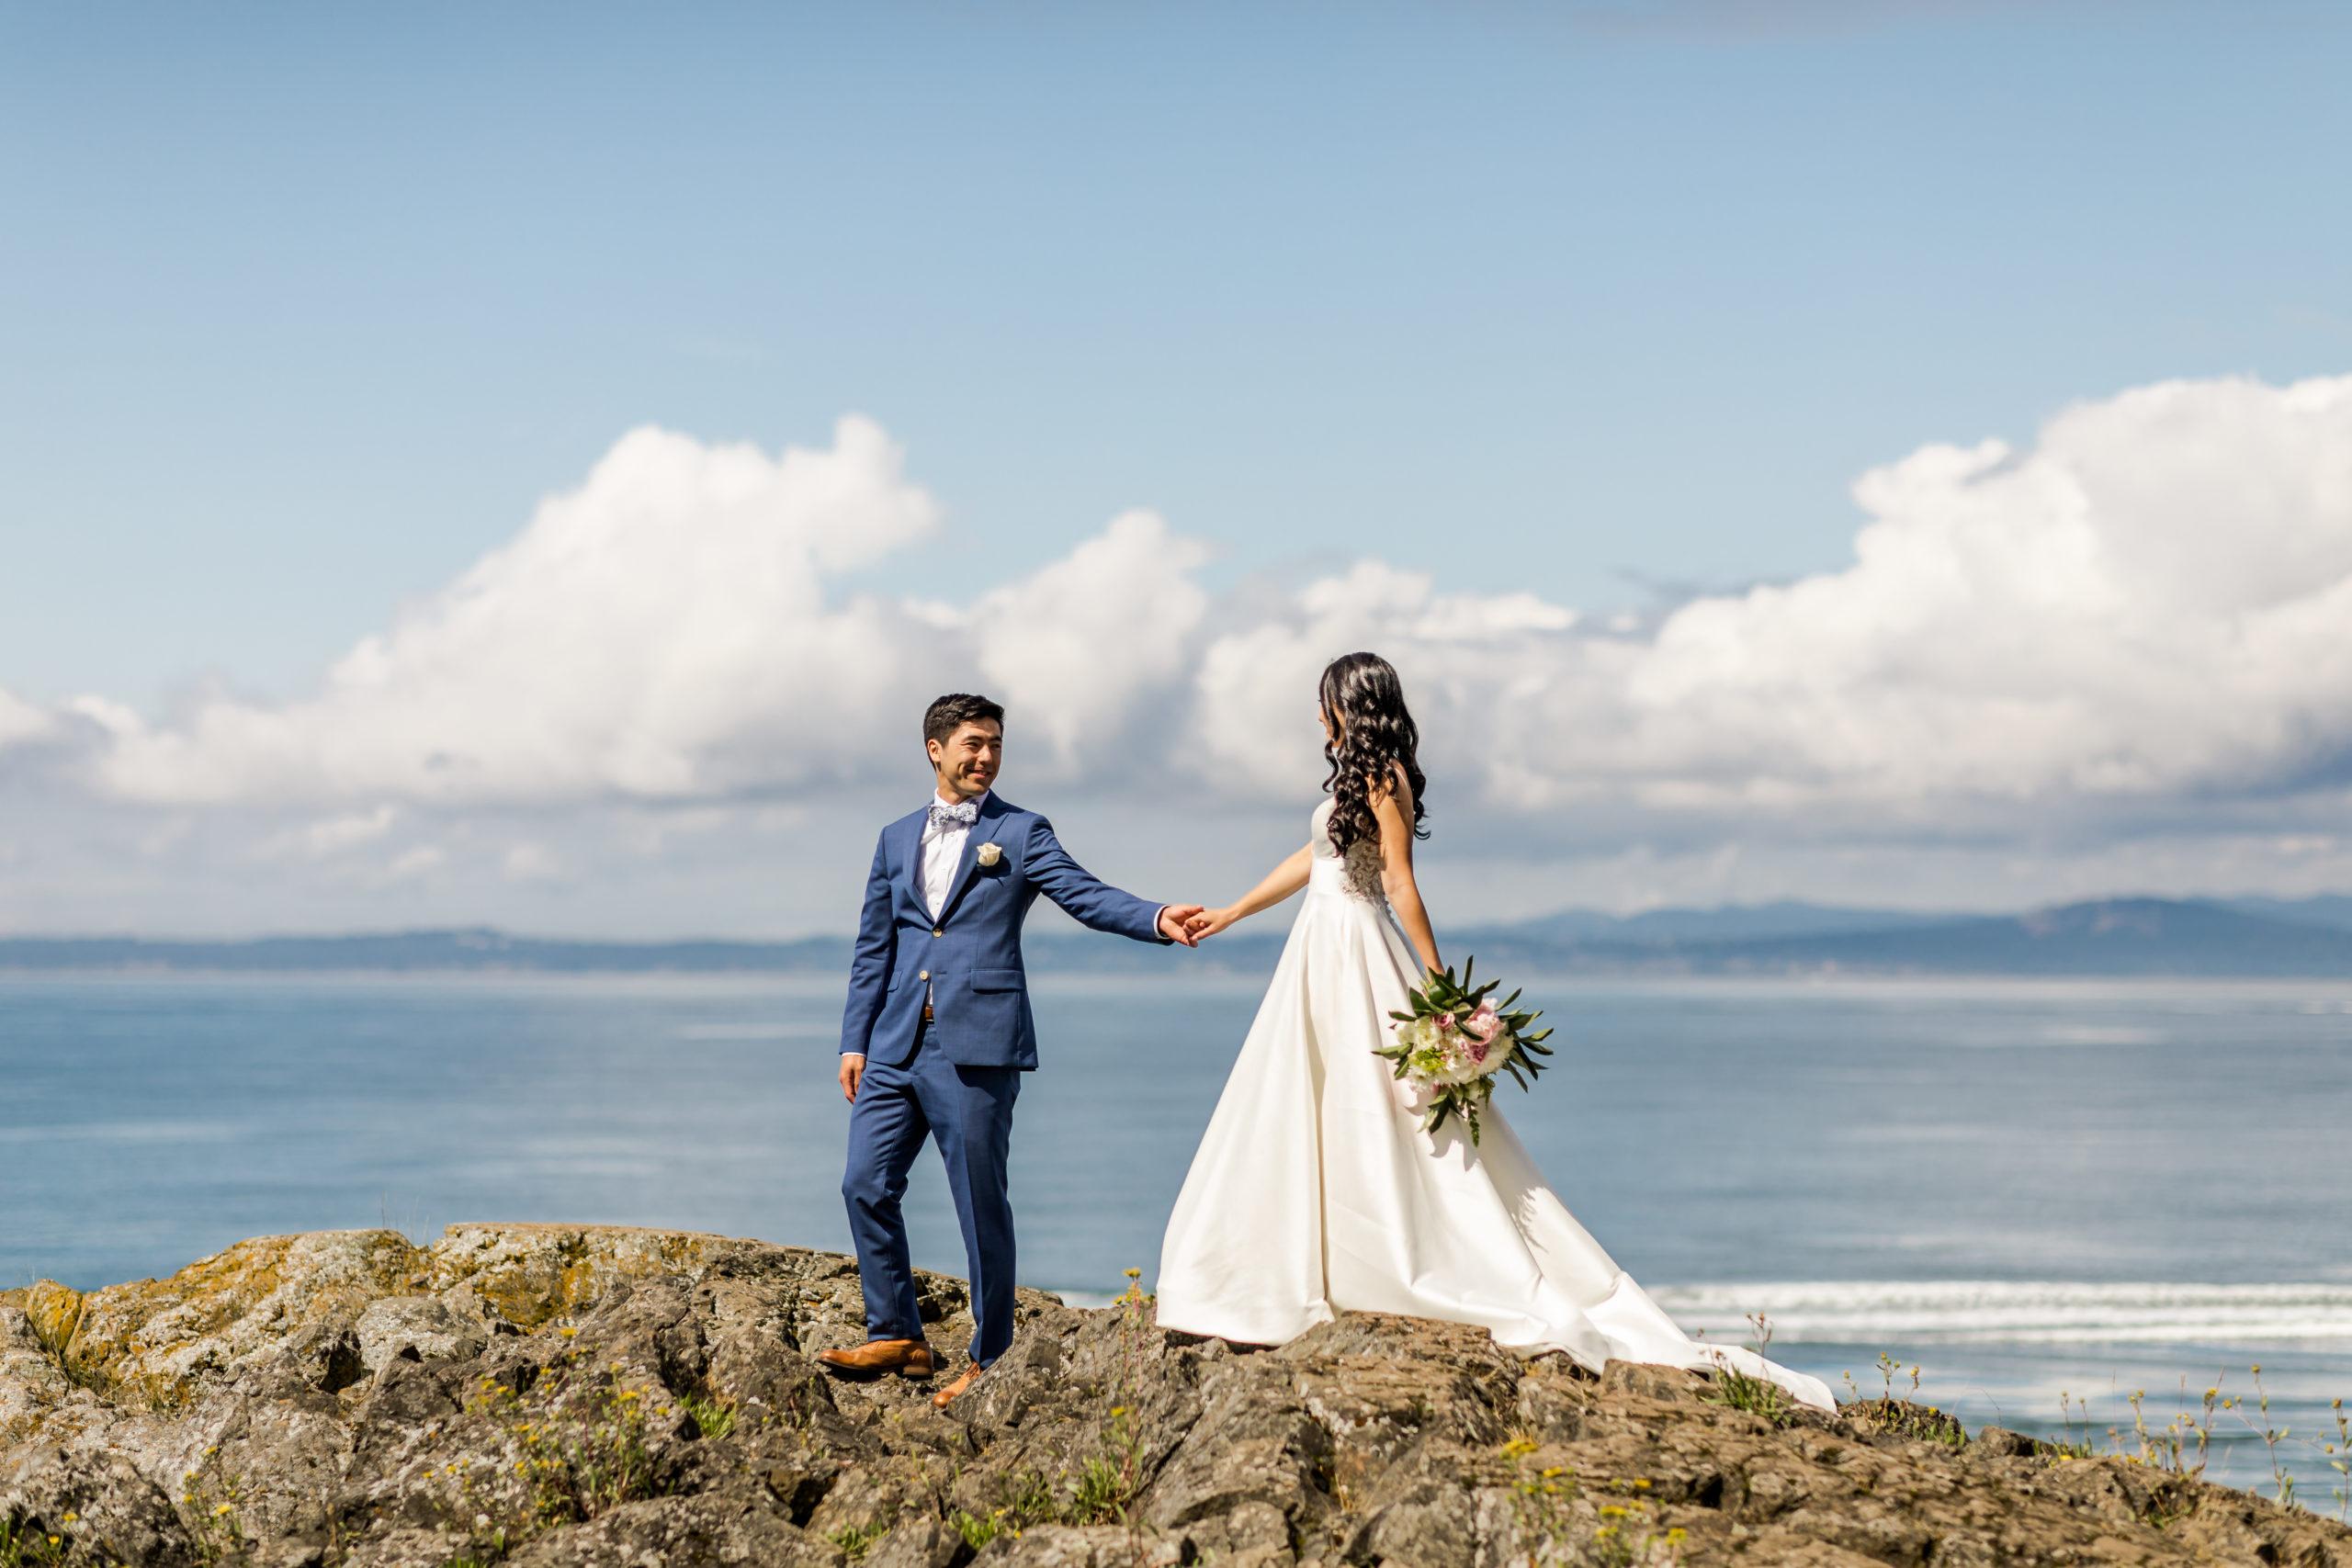 oregon elopement photographer, elopement experience breakdown with brogan marie photography, eloping in the pacific northwest, pnw elopement, brogan marie photography